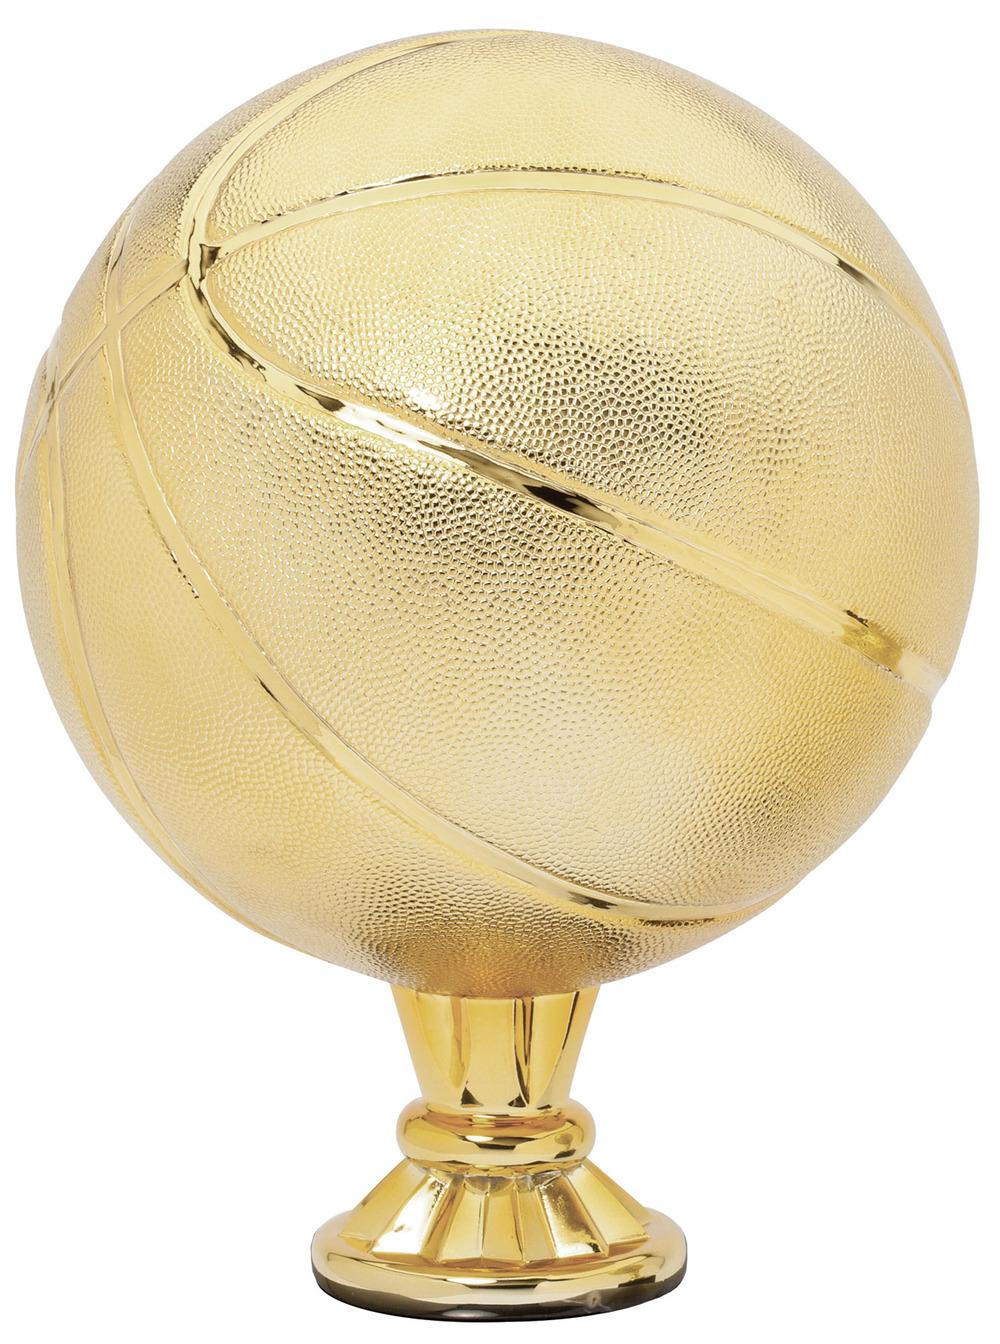 "Basketball - Gold   RG3103 - 11.5"" tall  Price = $109"